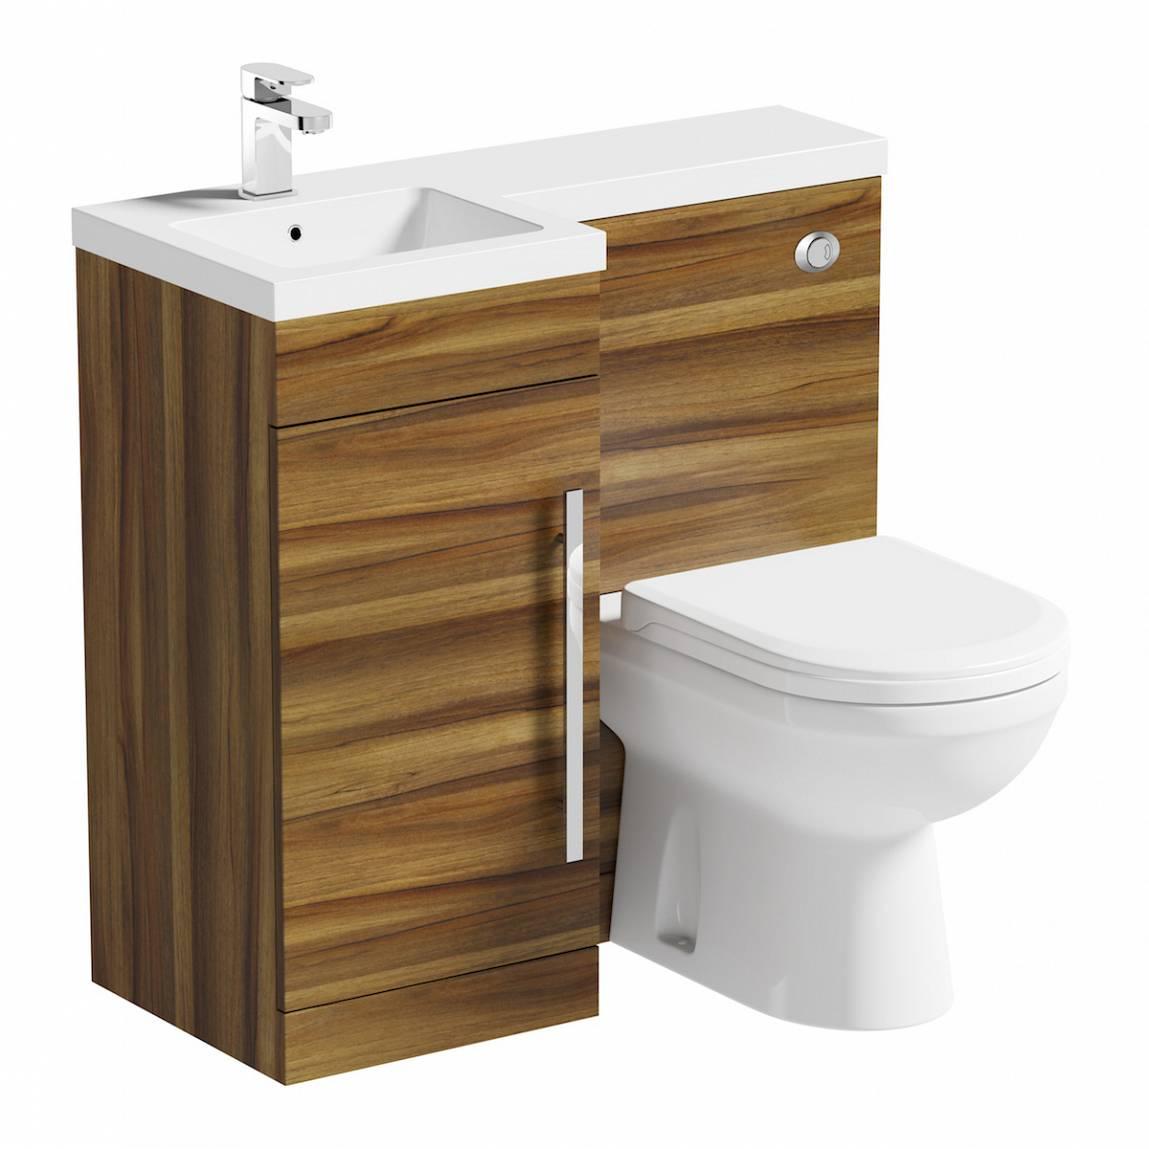 Image of MySpace Walnut Combination Unit LH with Autograph BTW Toilet